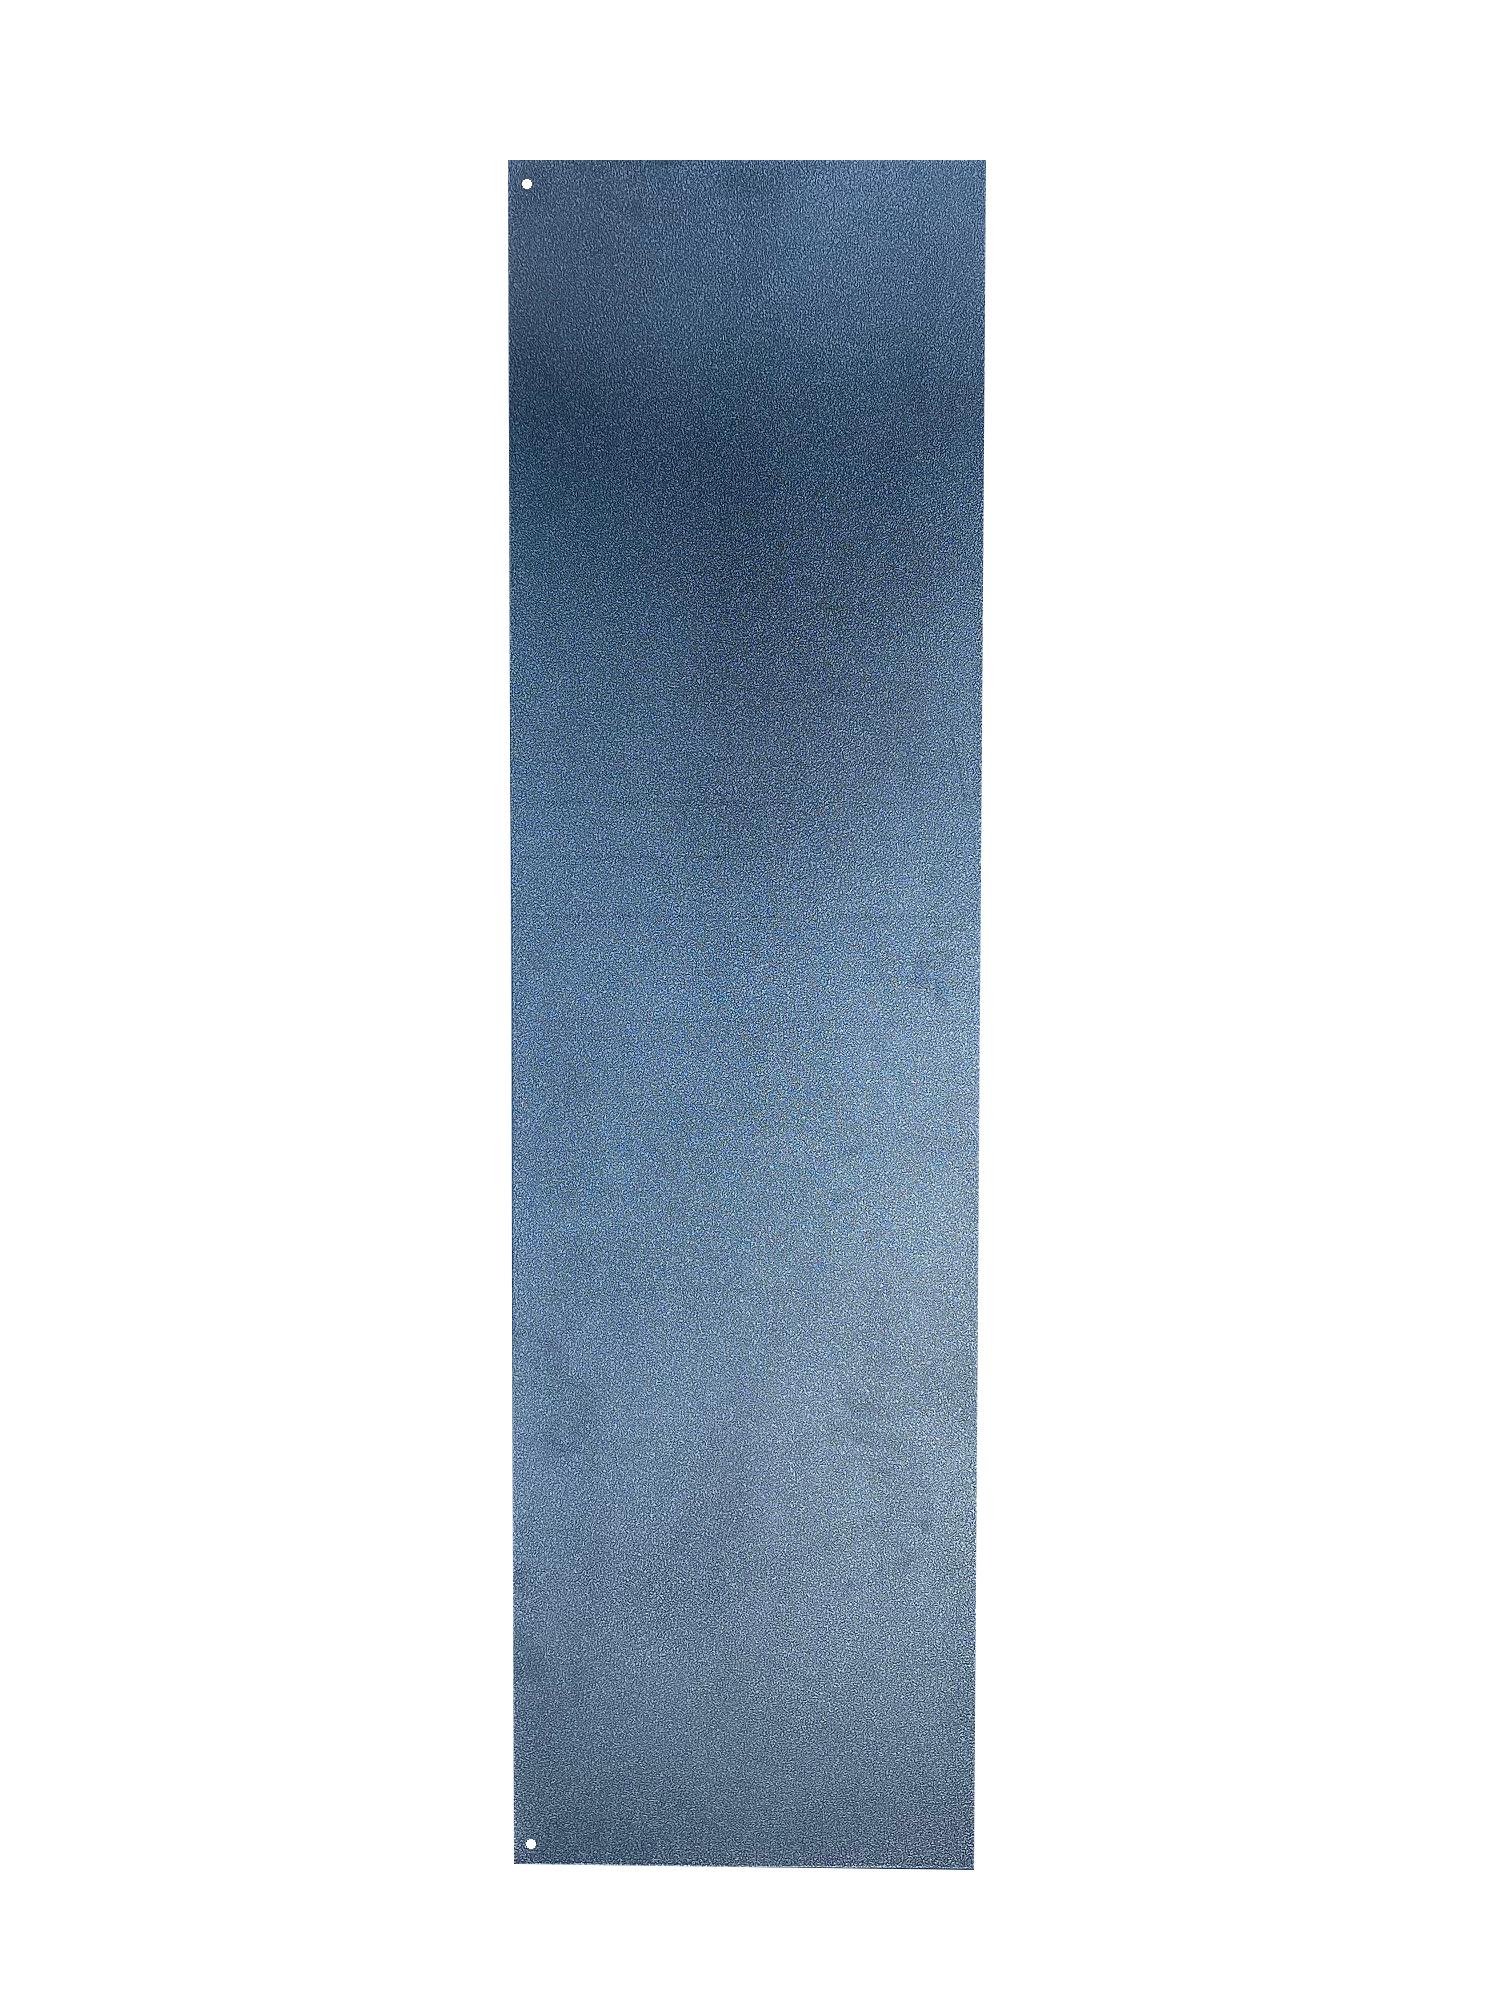 #6064C Insta 3'x3' Window Drip Plate Extension